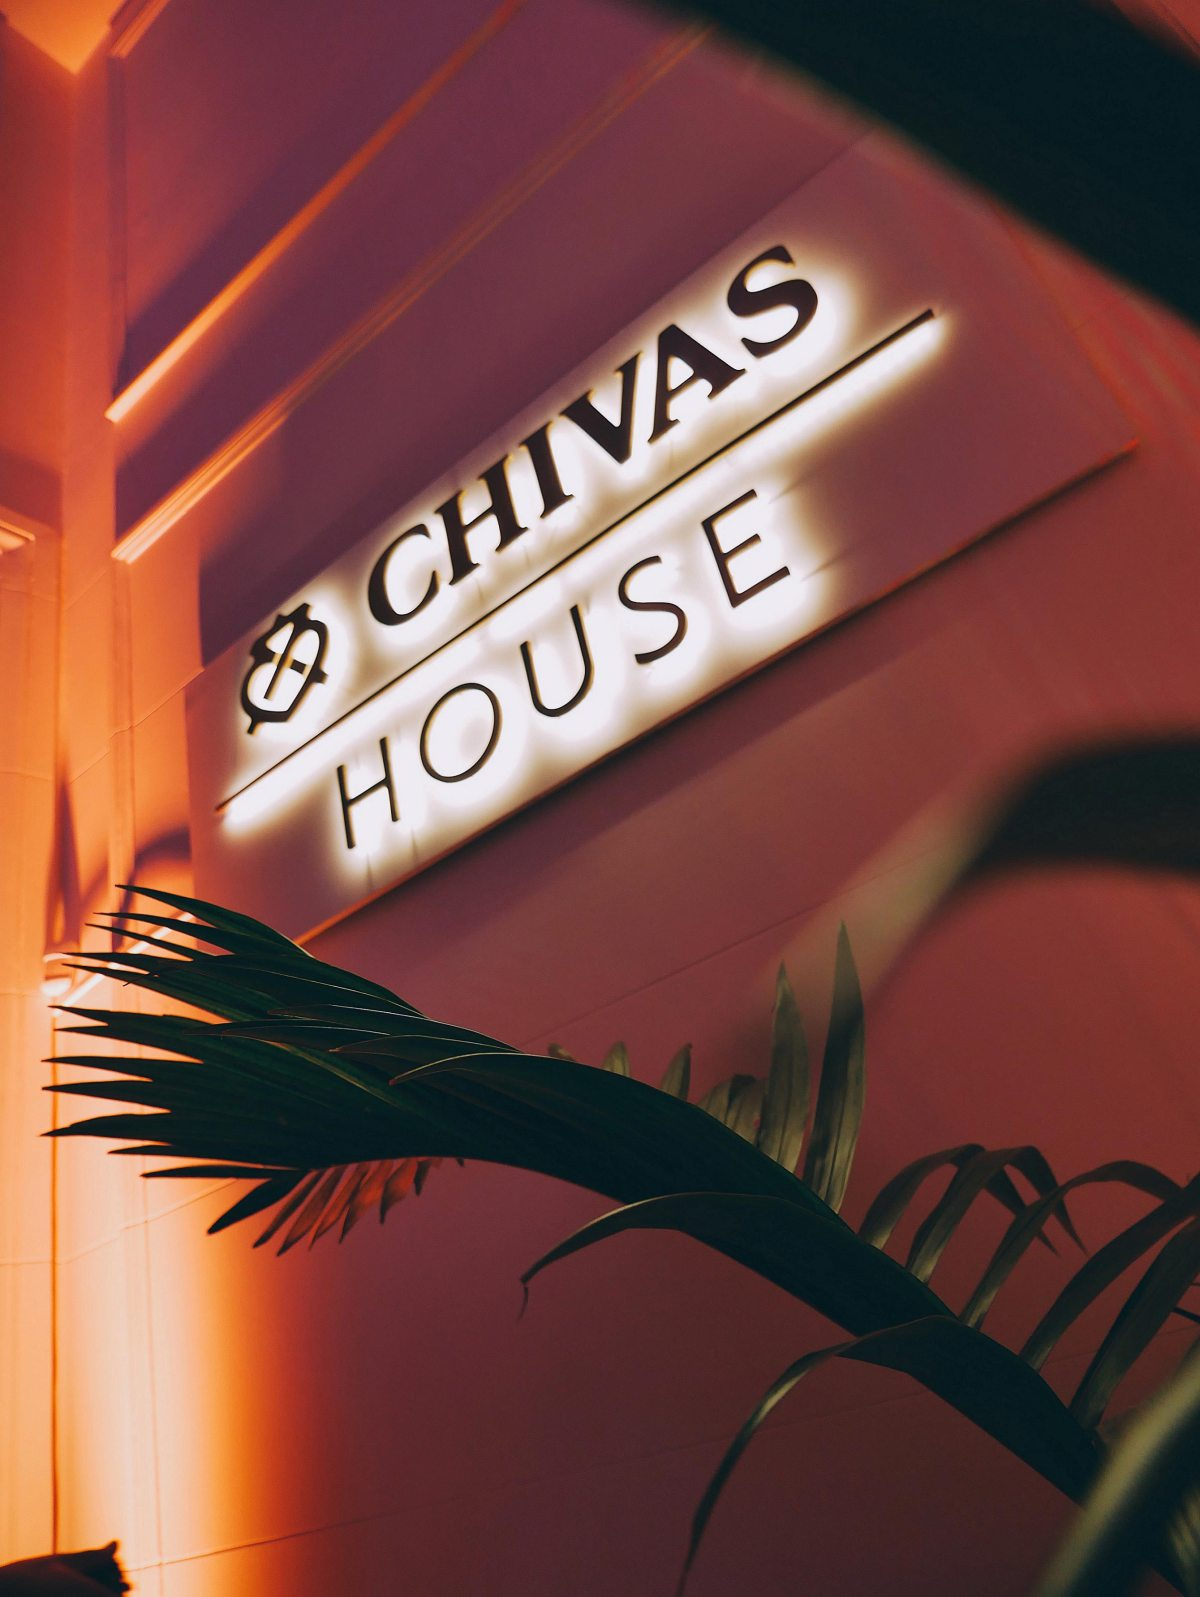 CHIVAS HOUSE